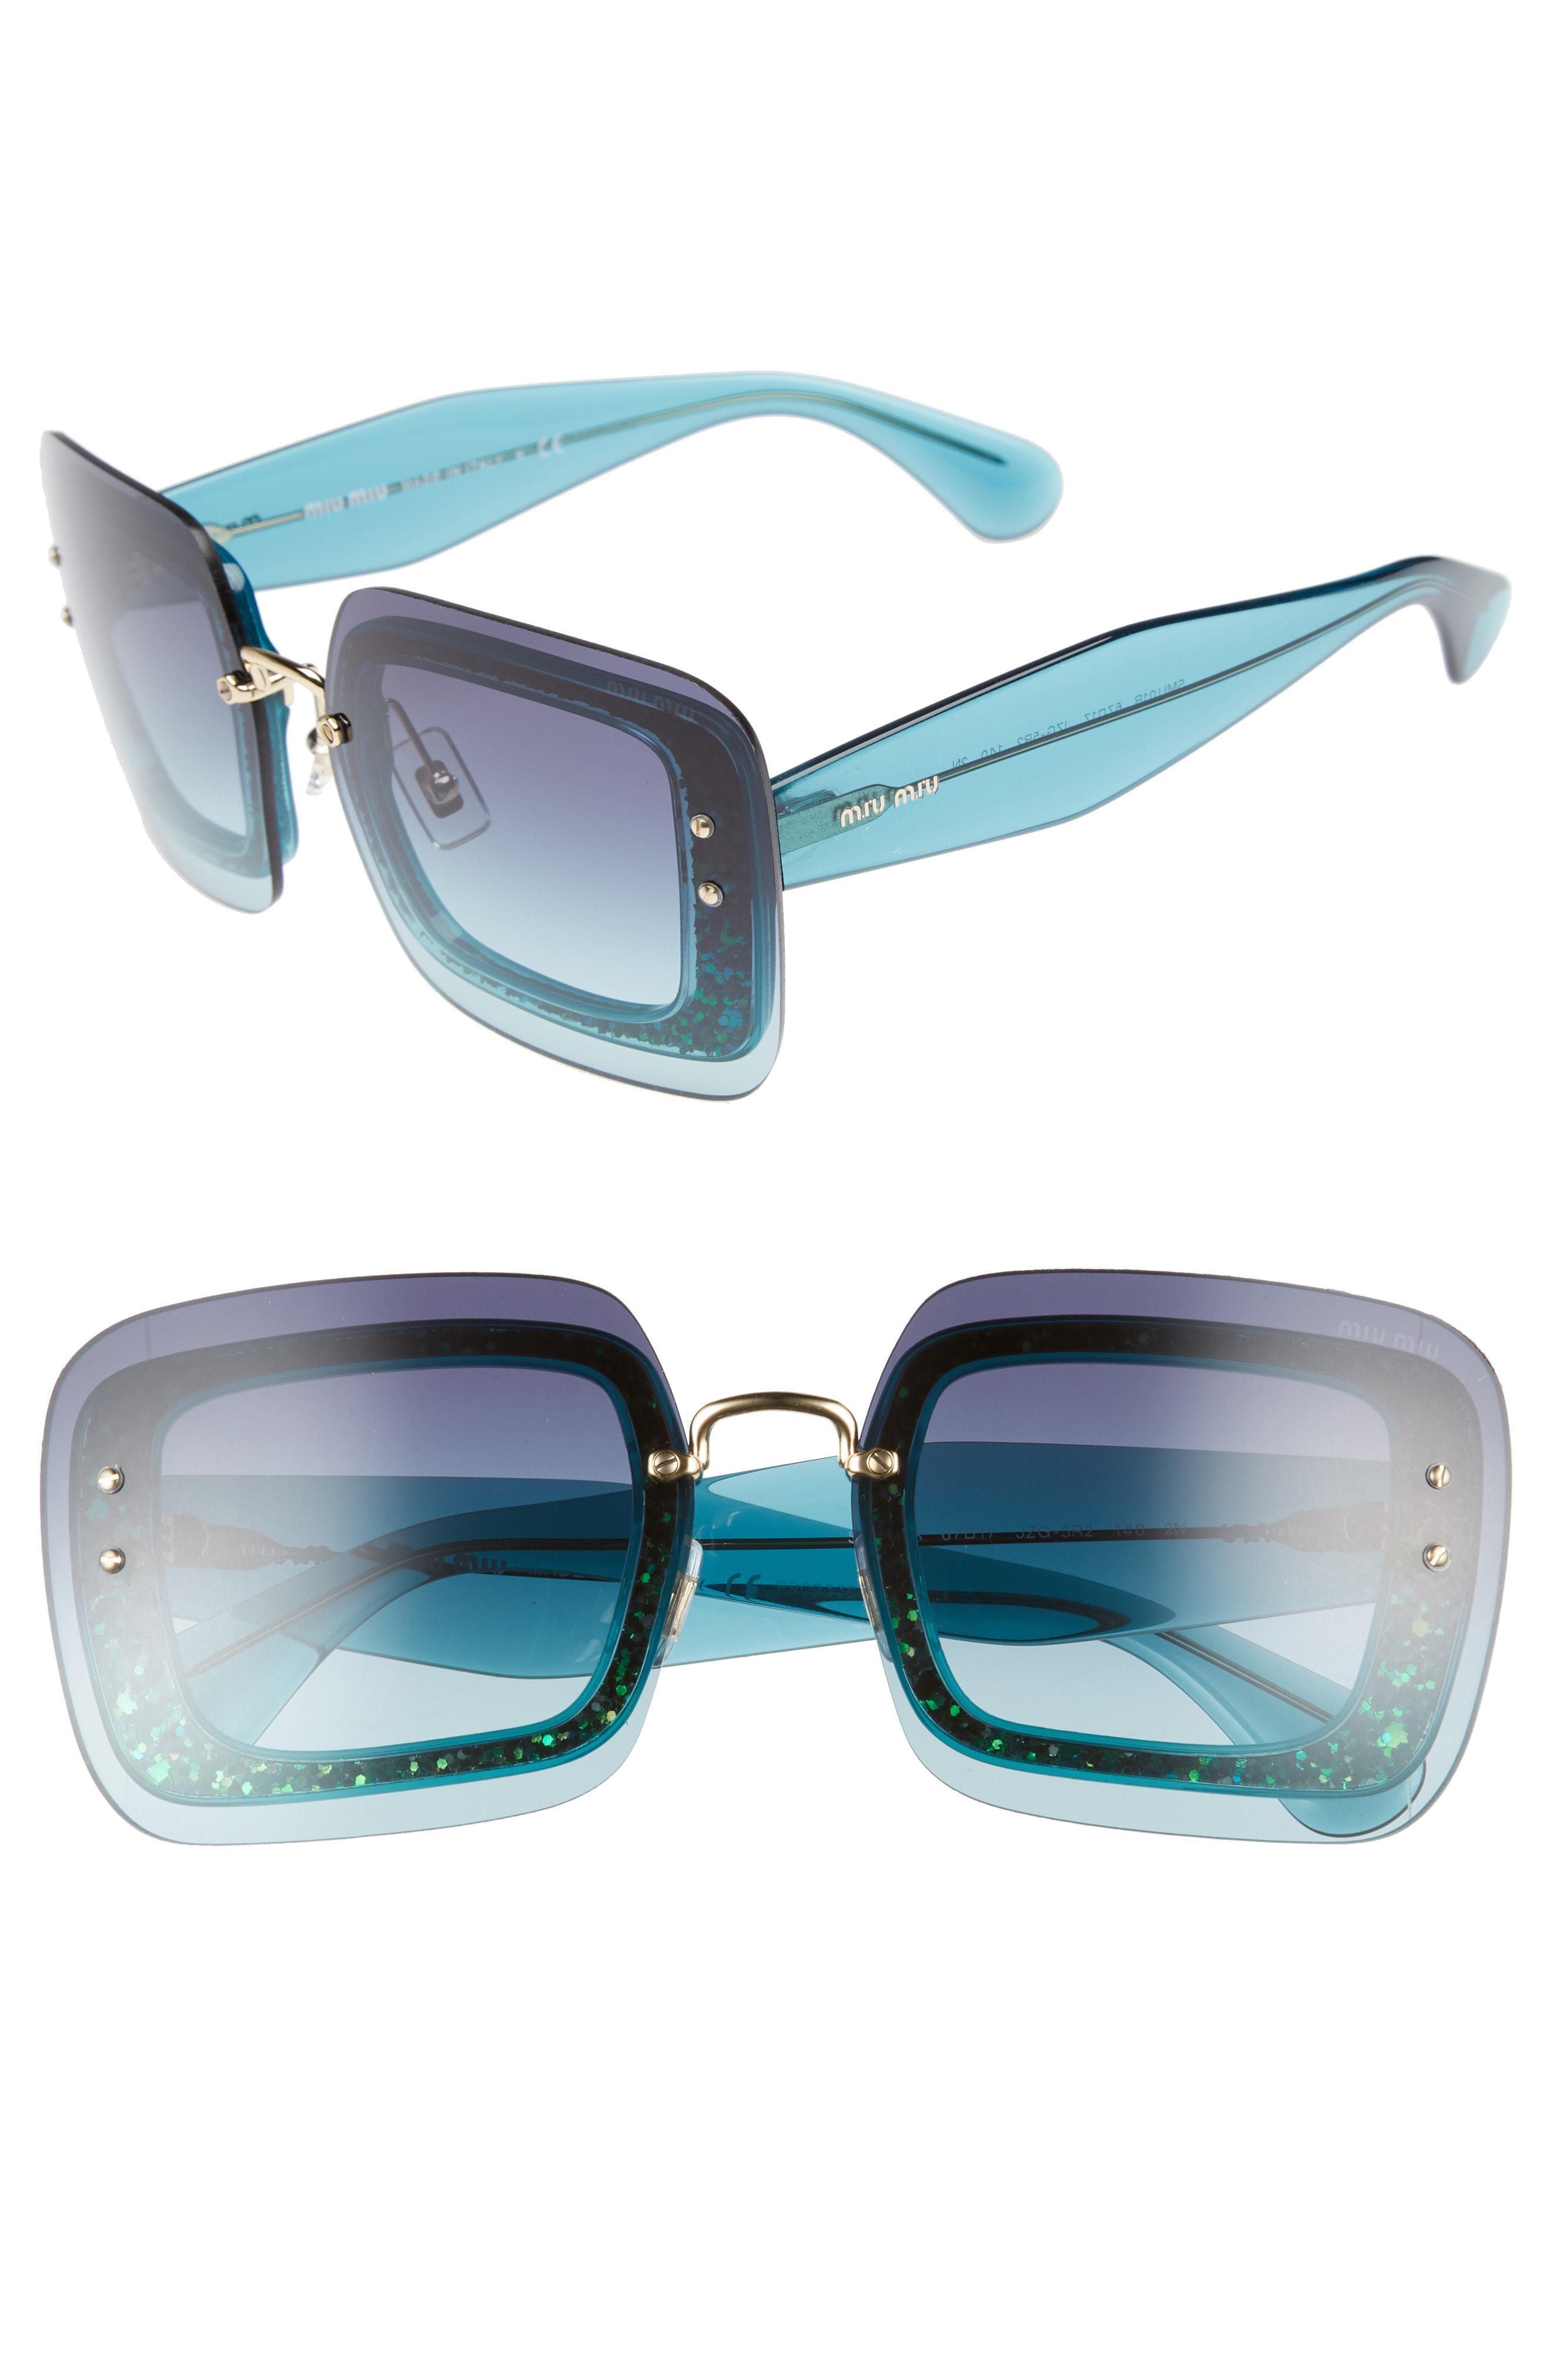 87477653a5 Lyst - Miu Miu 67mm Square Sunglasses - Turquoise Gradient in Blue